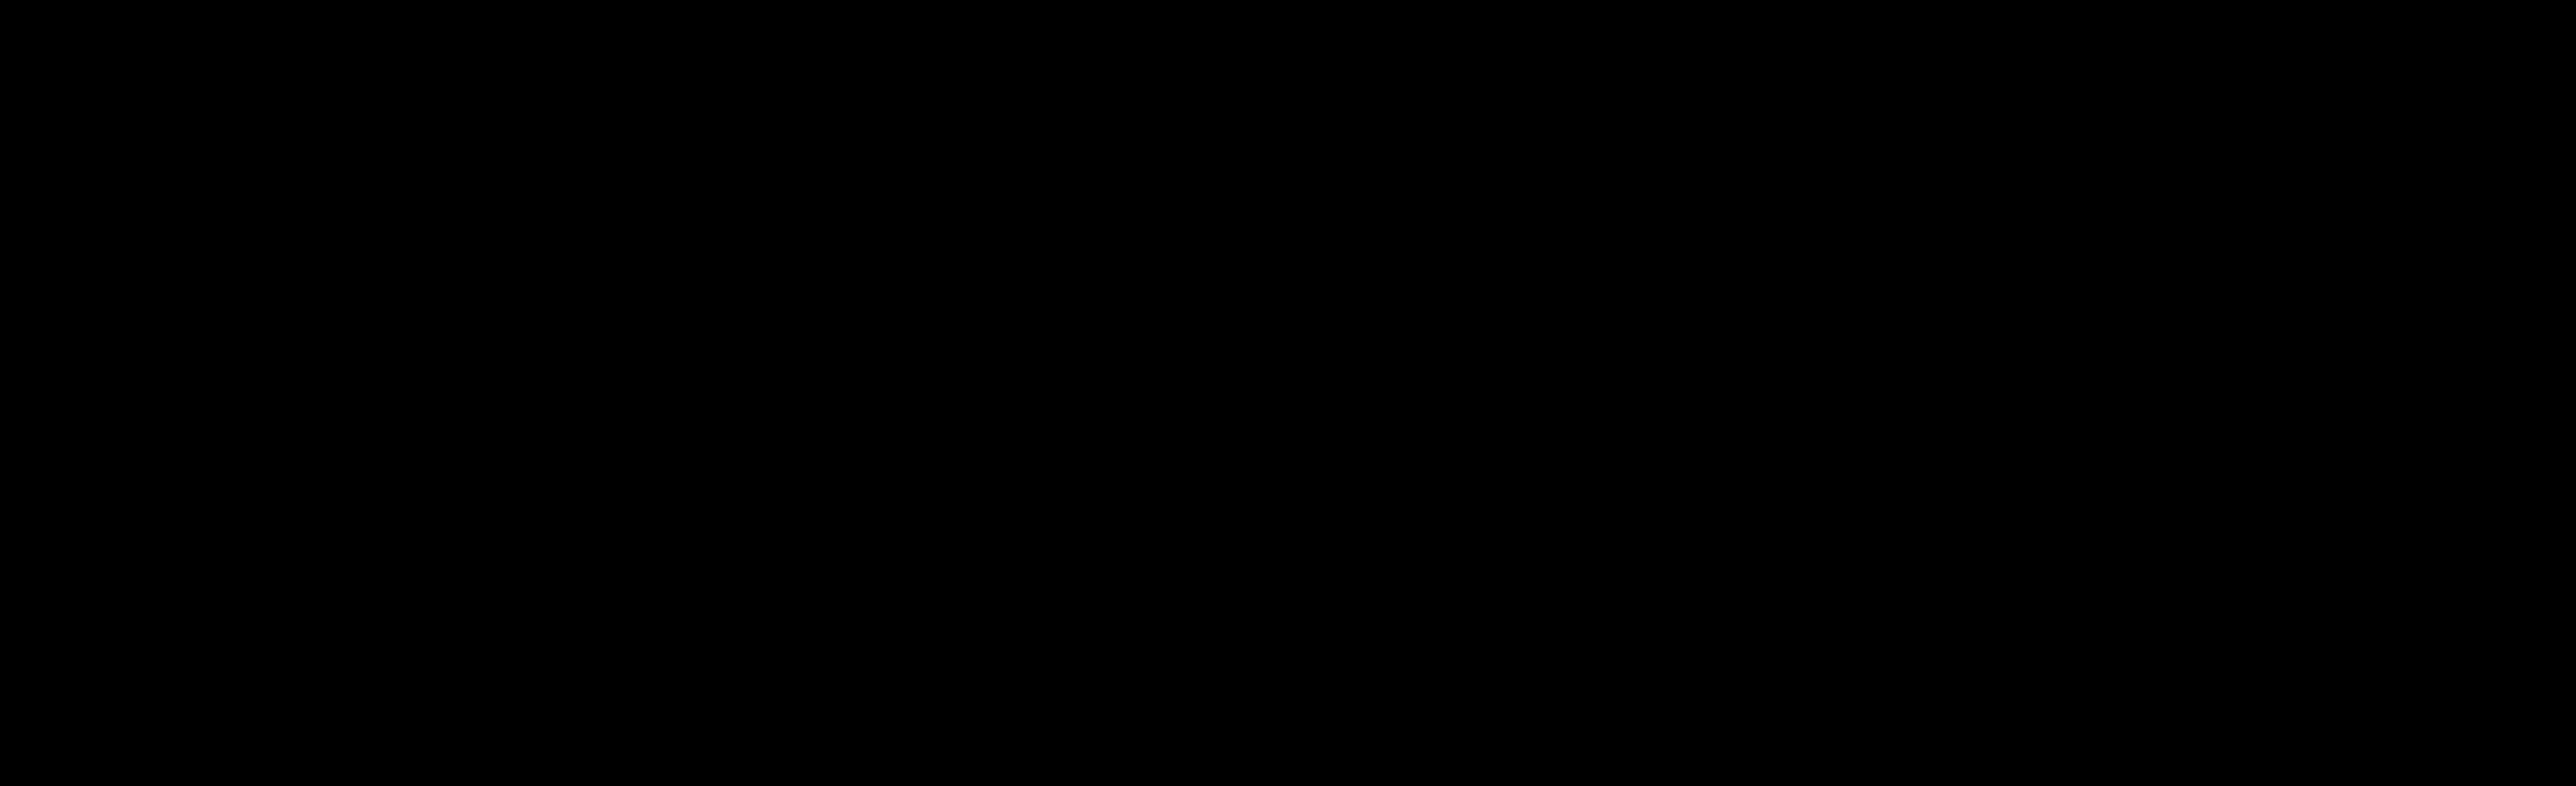 David Sandy Official Logo